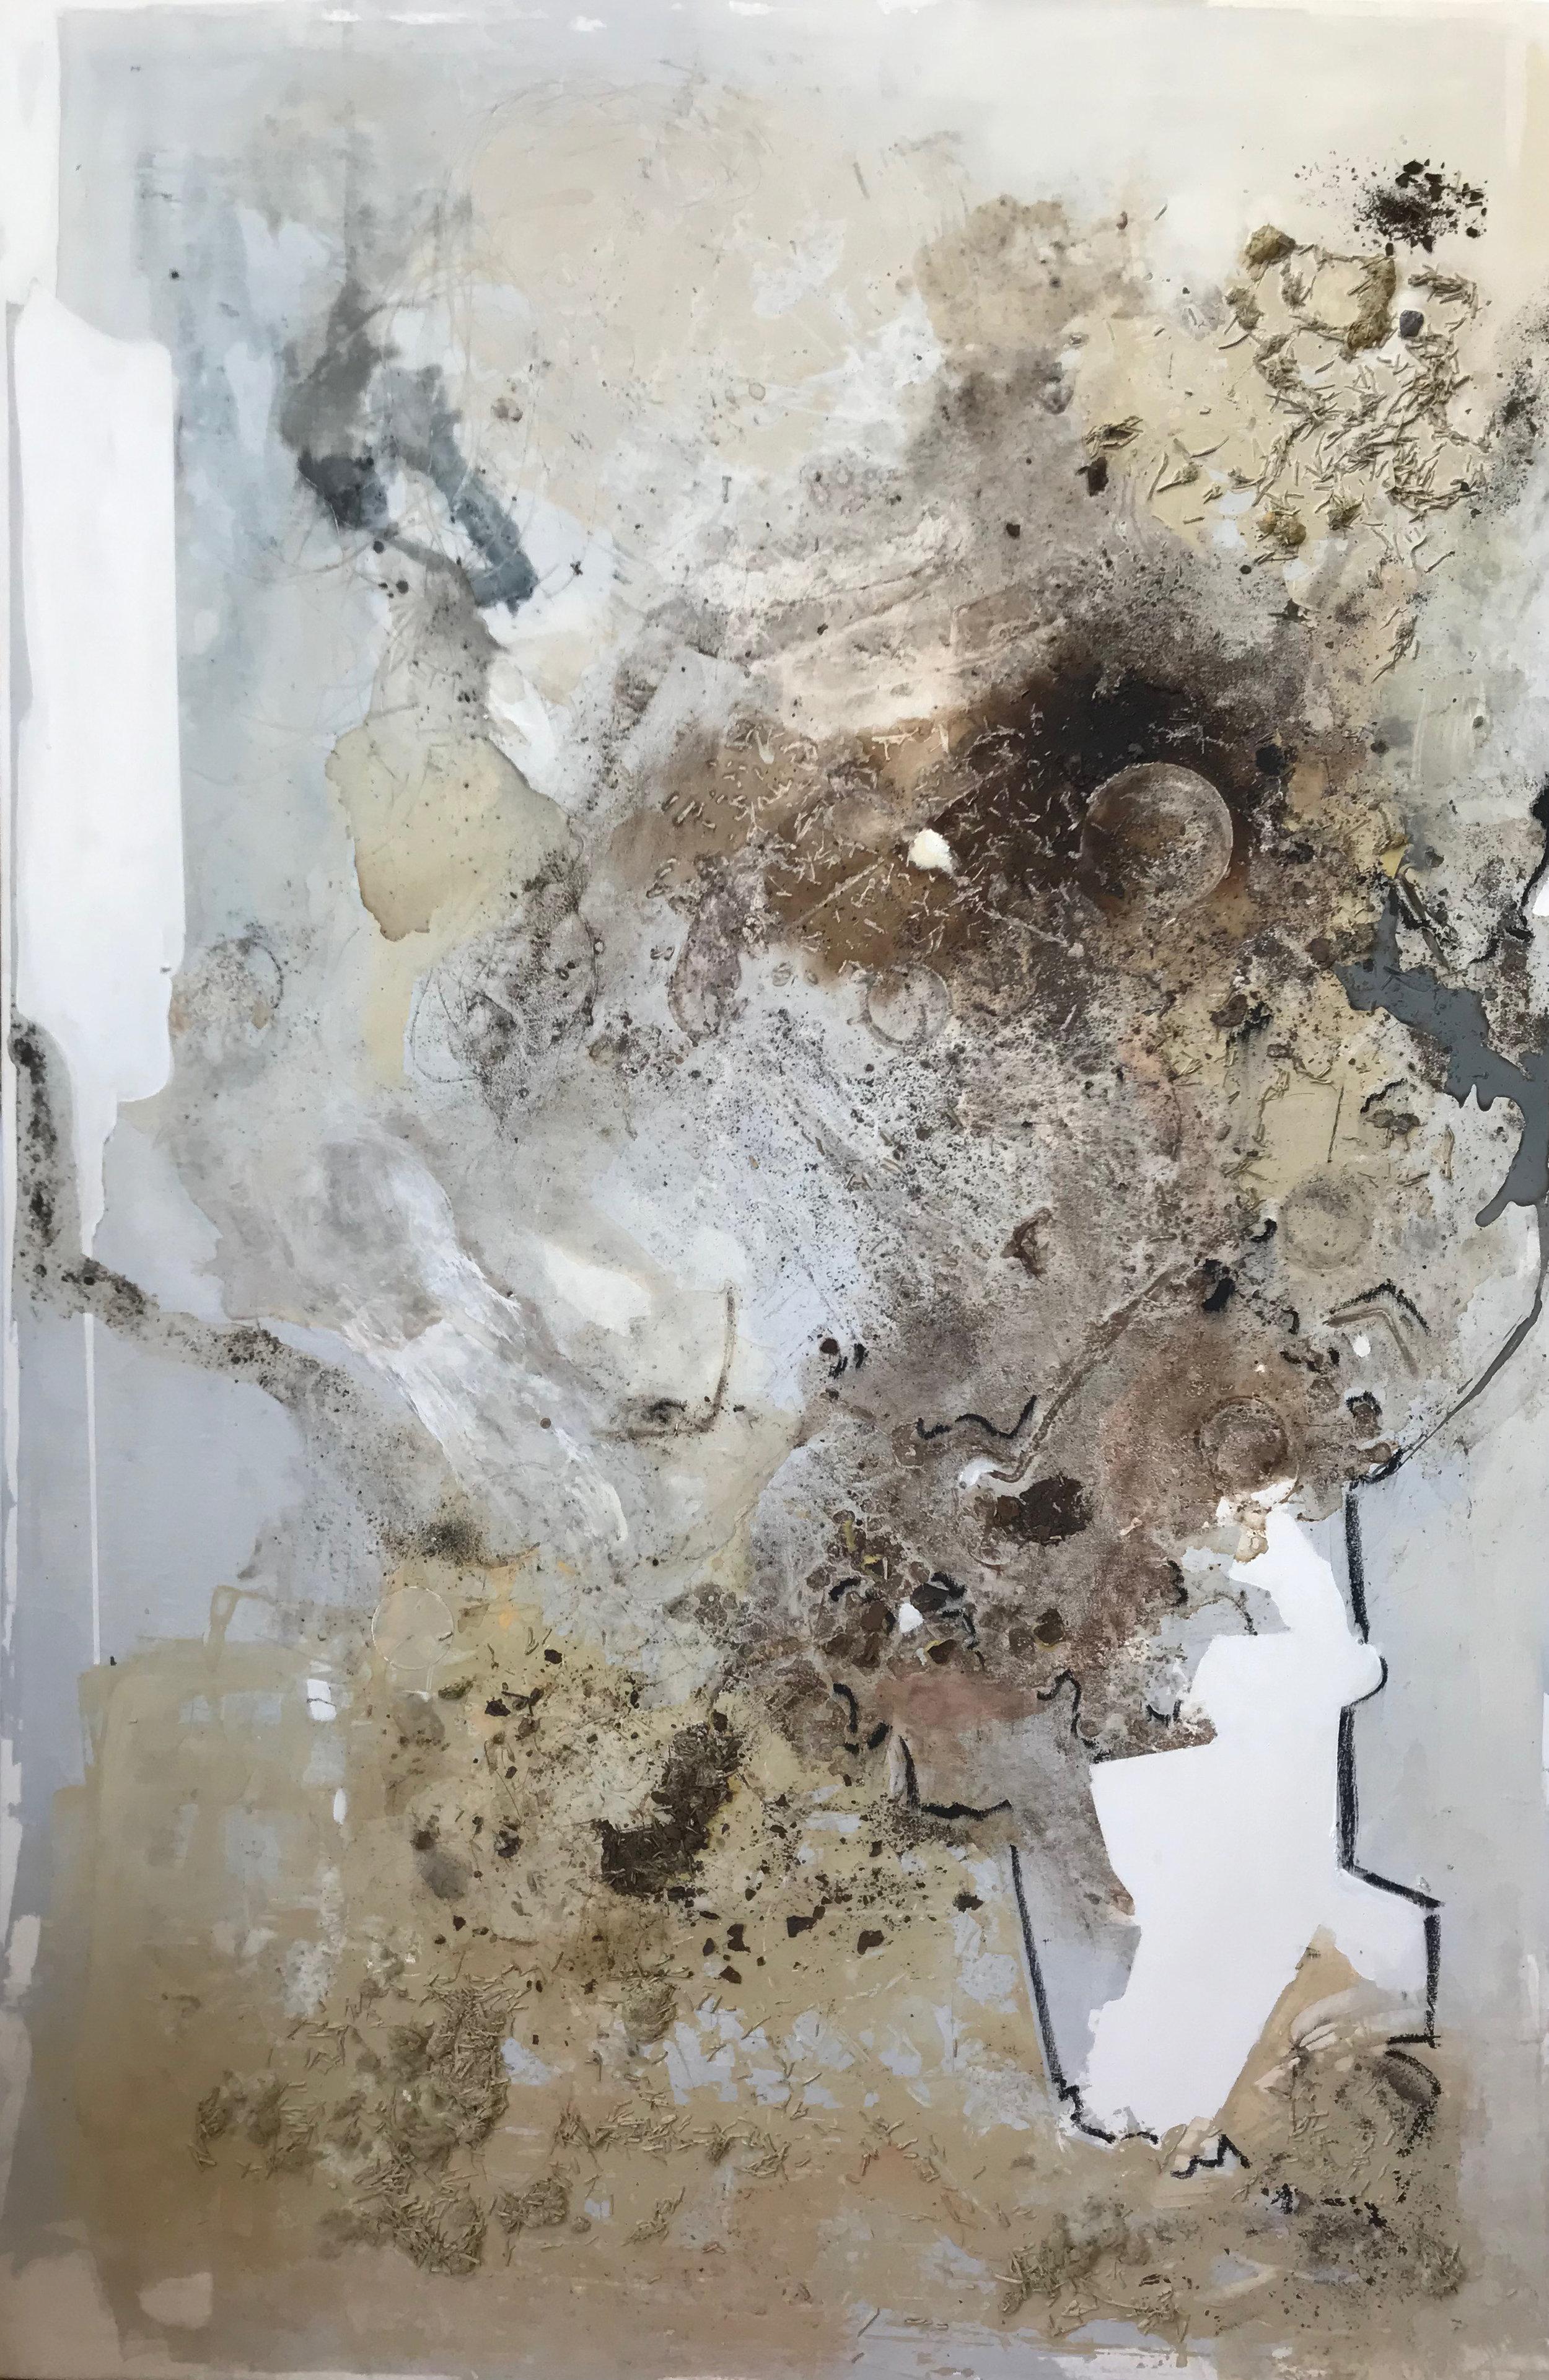 Küf #1 , 2019 mixed media on canvas 72 x 50 inches